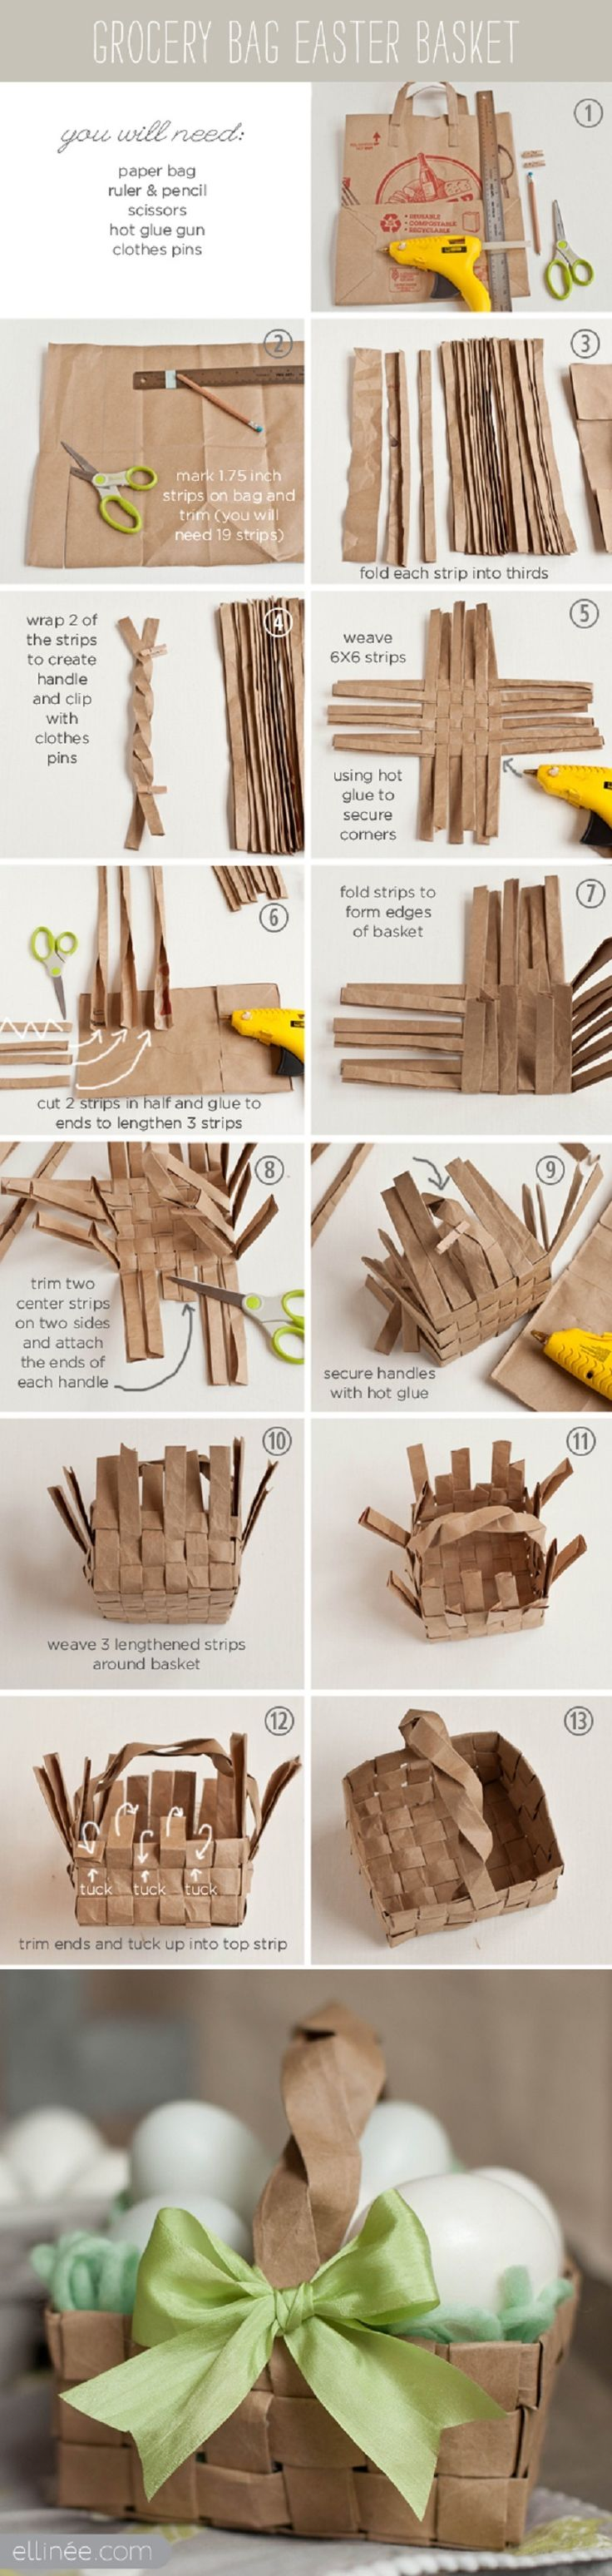 15 Creative DIY Easter Basket Ideas   GleamItUp